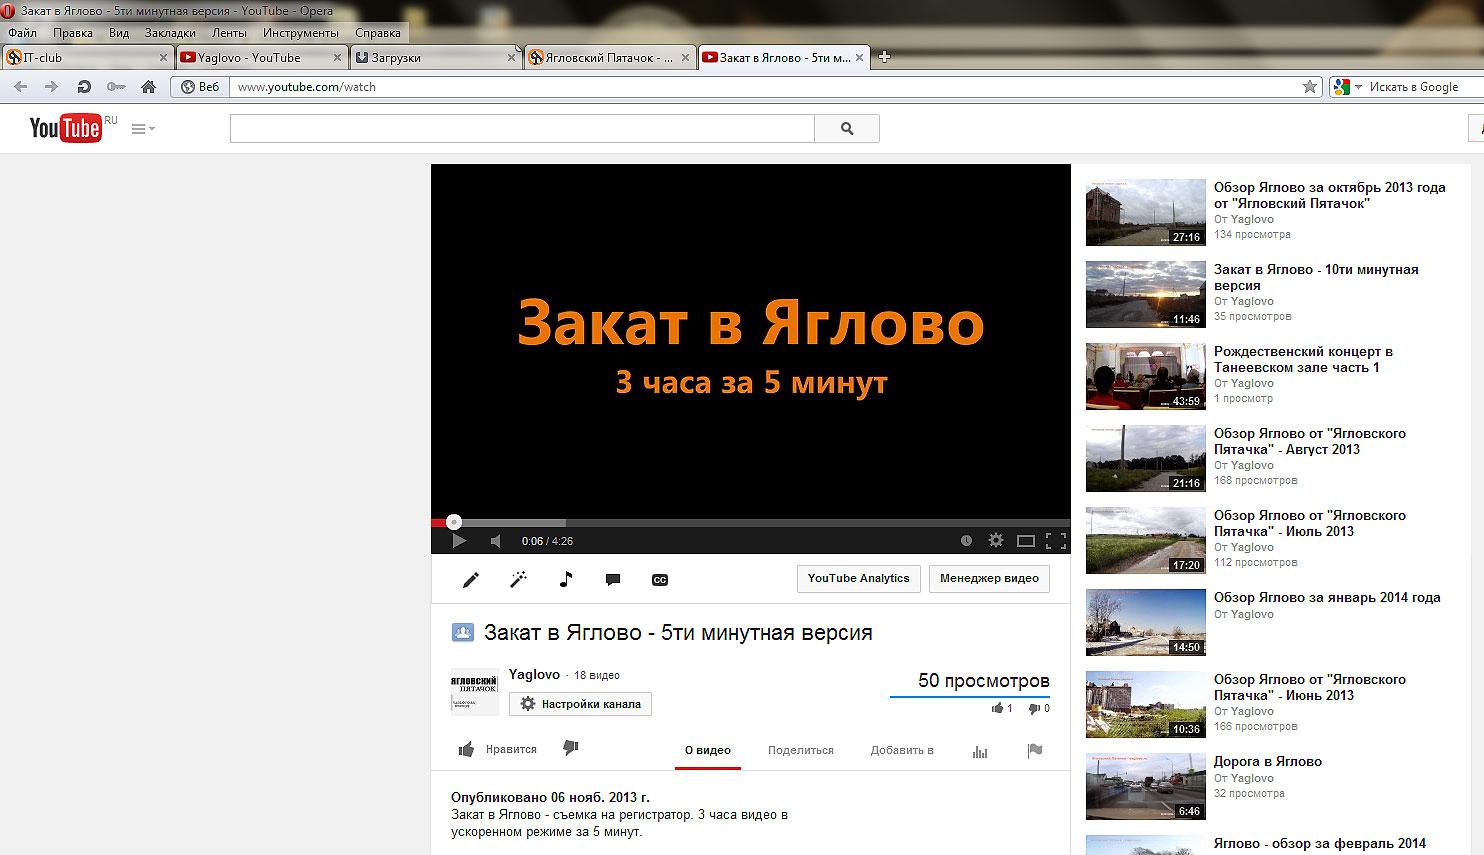 Открываем нужное нам видео на сайте youtube